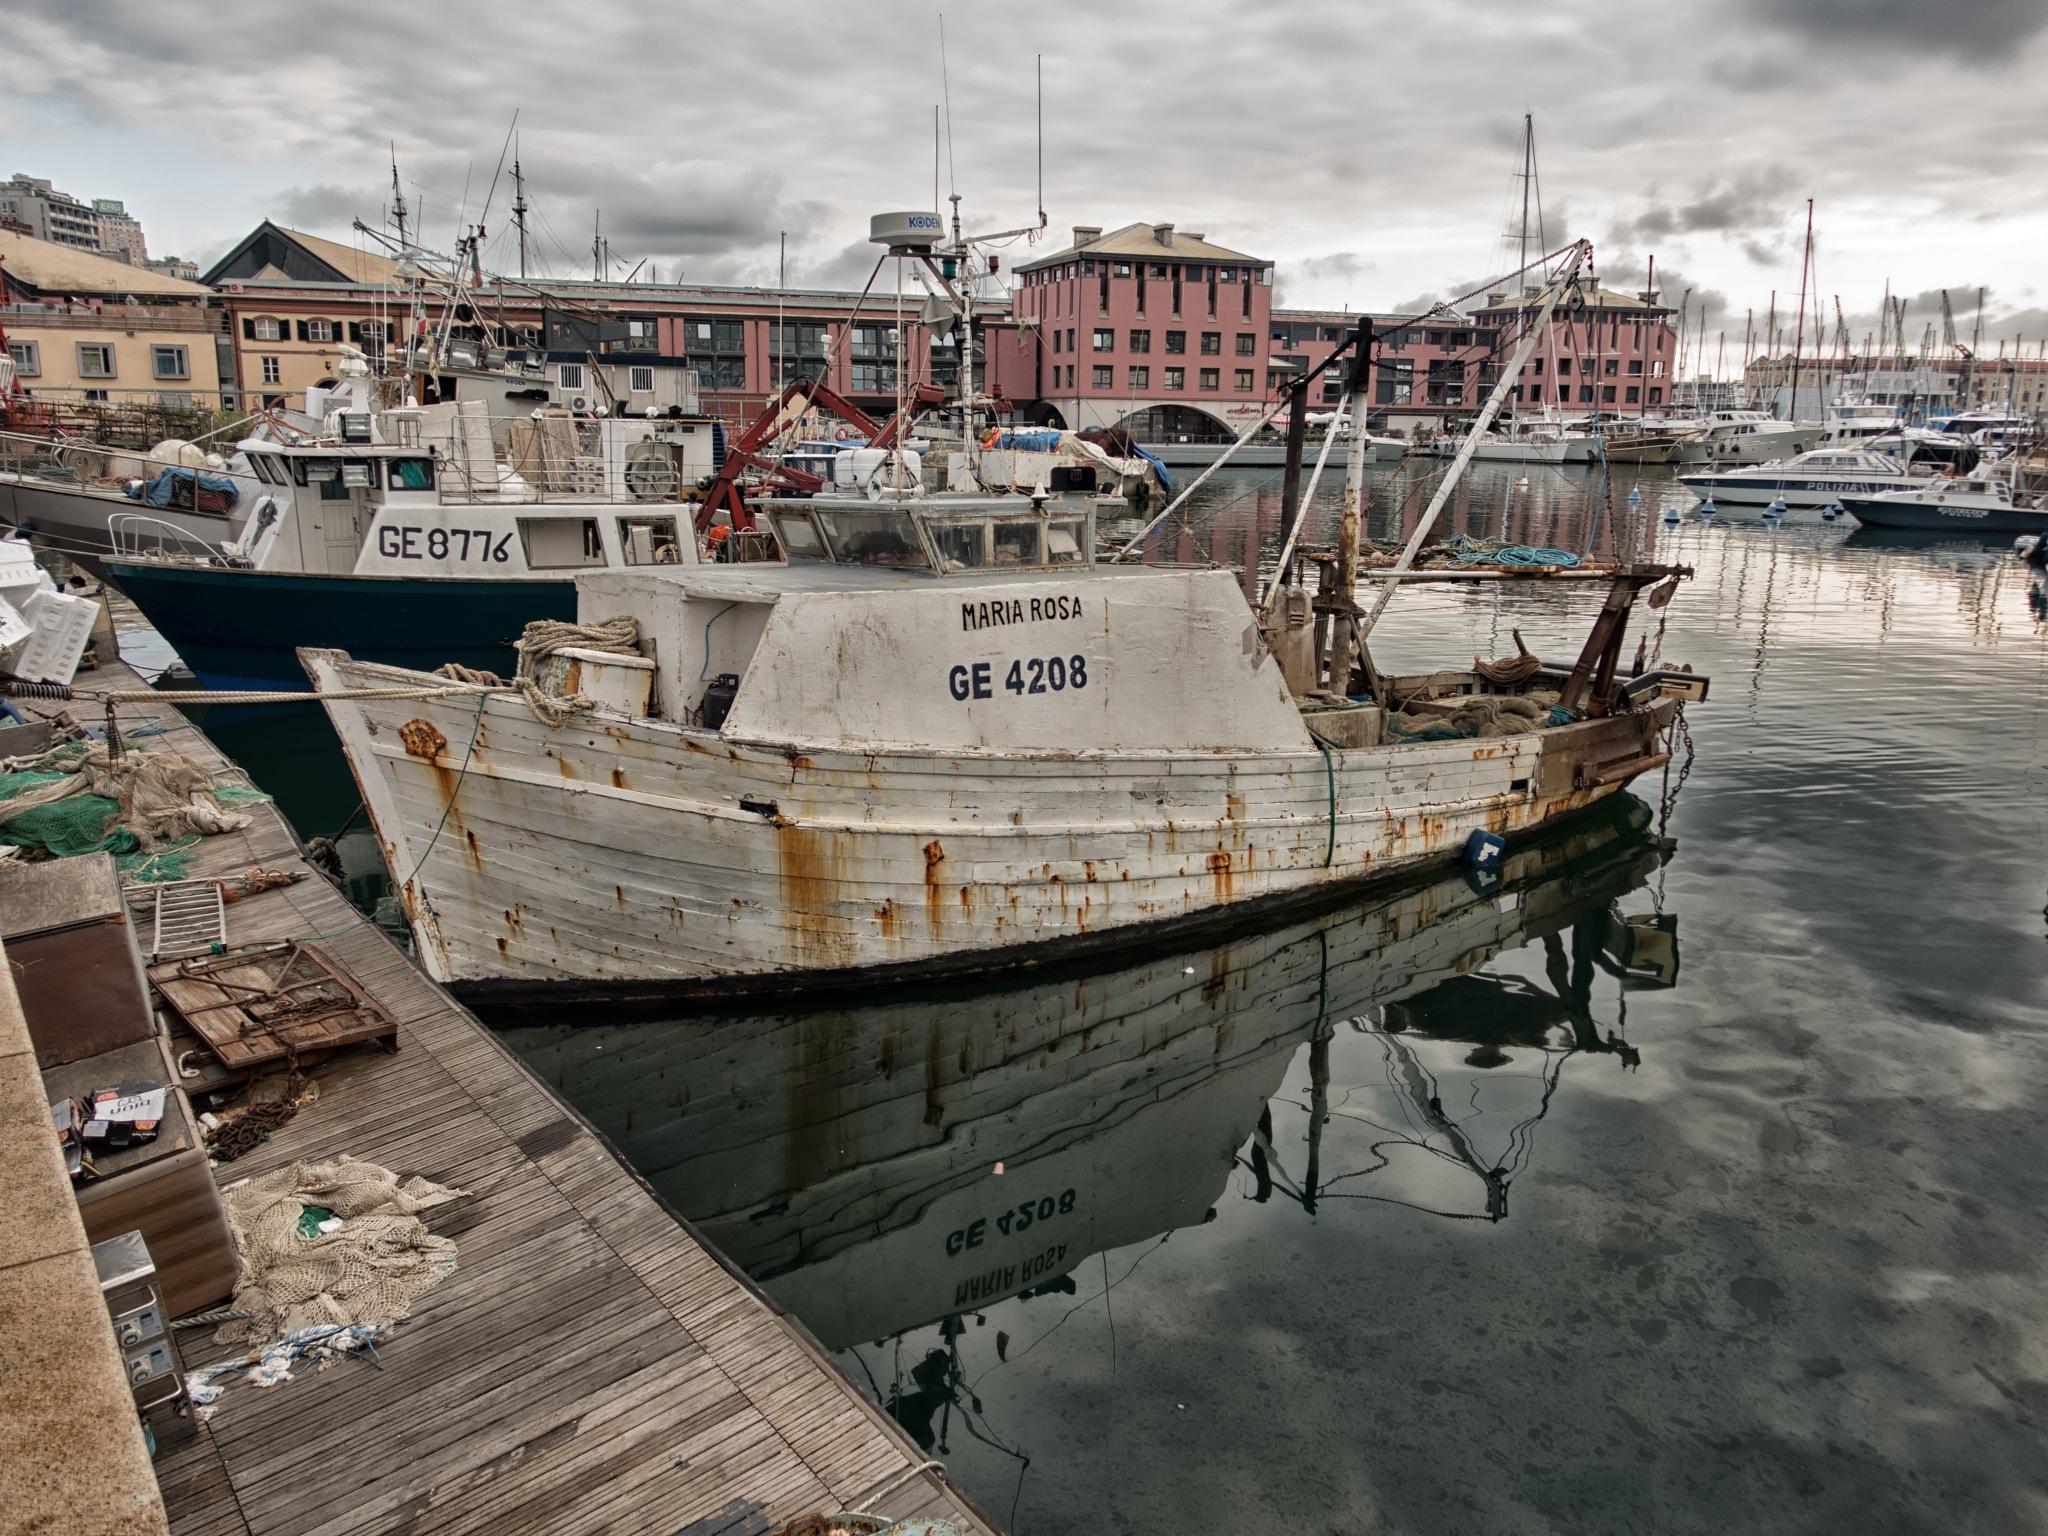 Maria Rosa fishboat in the Genoa docks by sunrisesunset